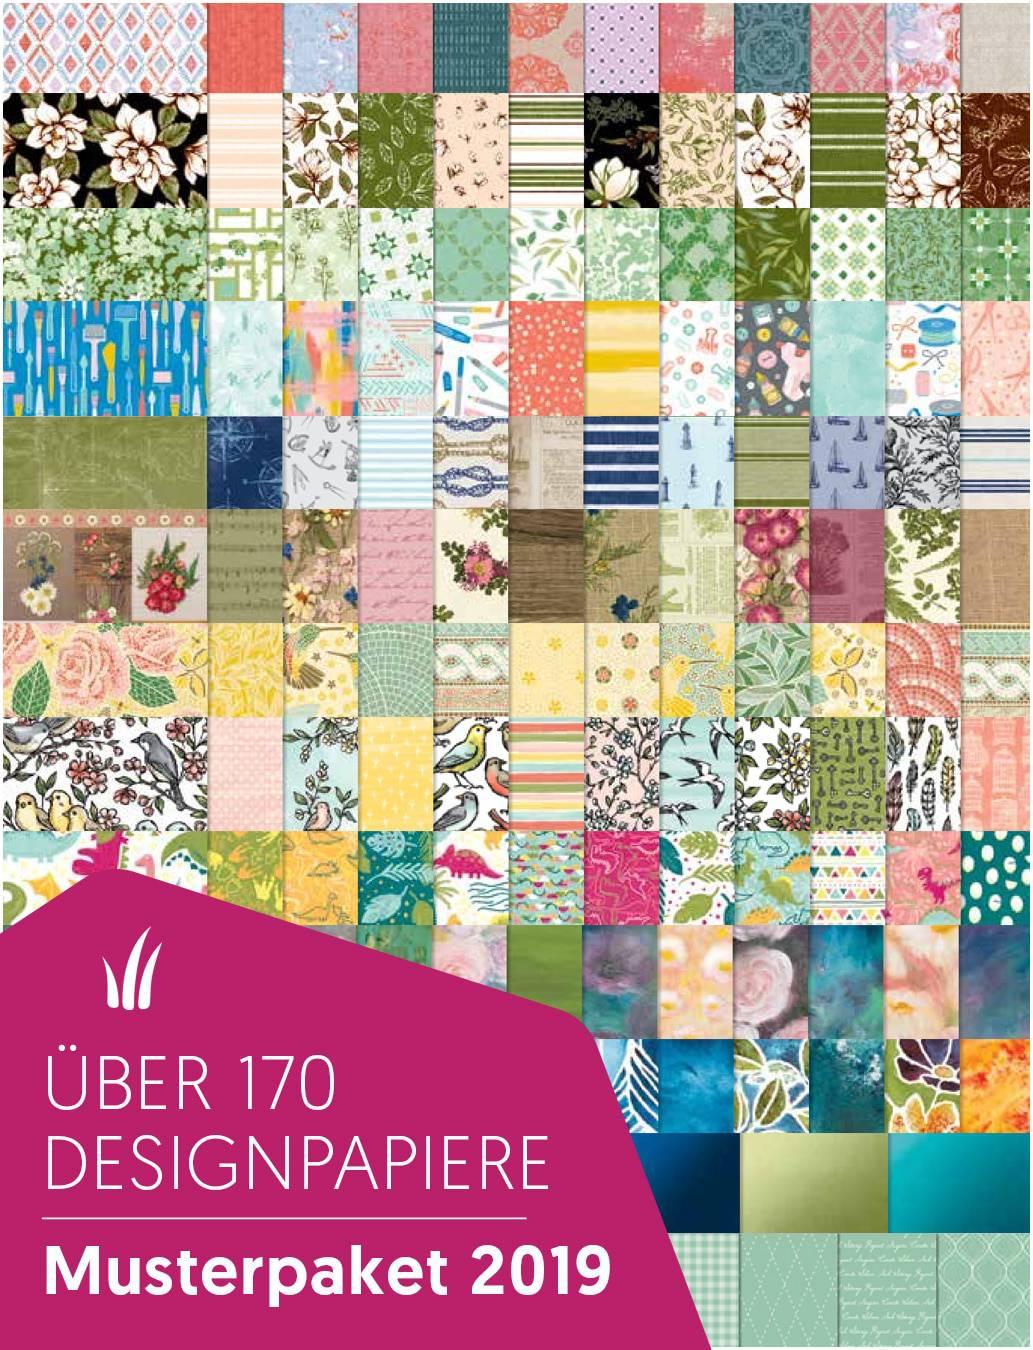 Designerpapier Share - Musterpakete 2019 1